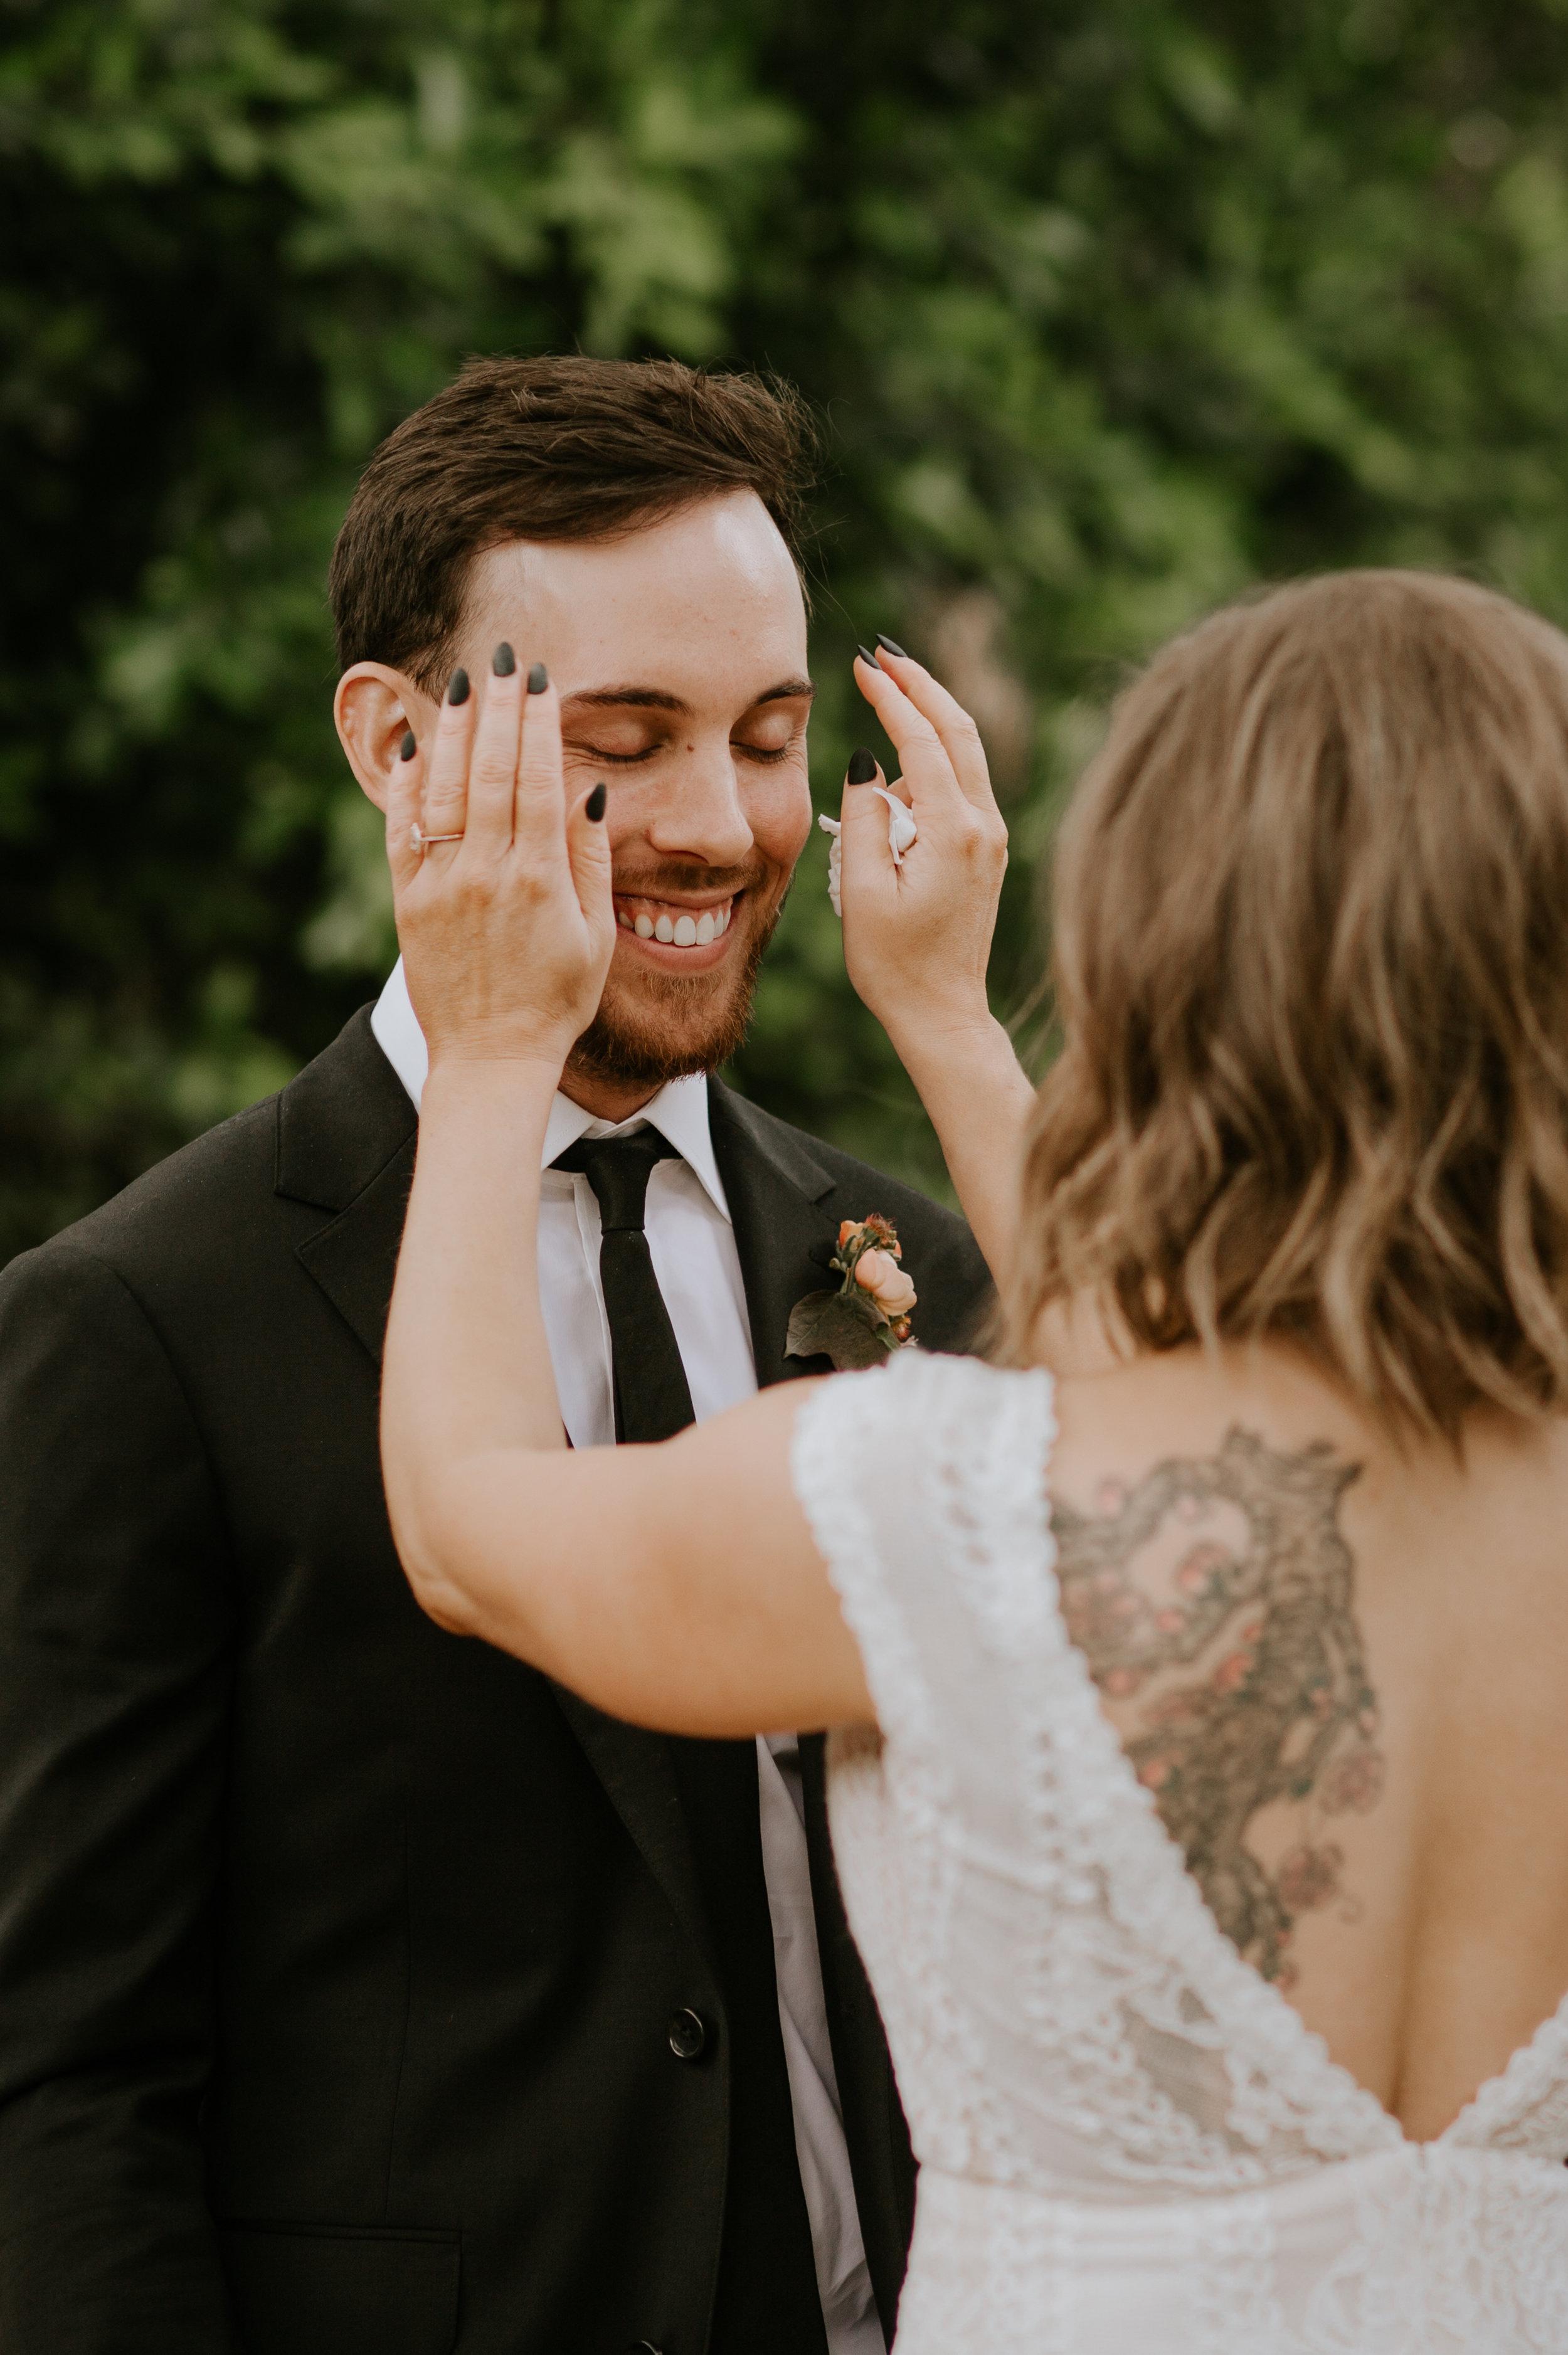 2019-05-26_Callie-Evan_Wedding_Joshua Tree_Paige Nelson_PREVIEWS HR-22.jpg